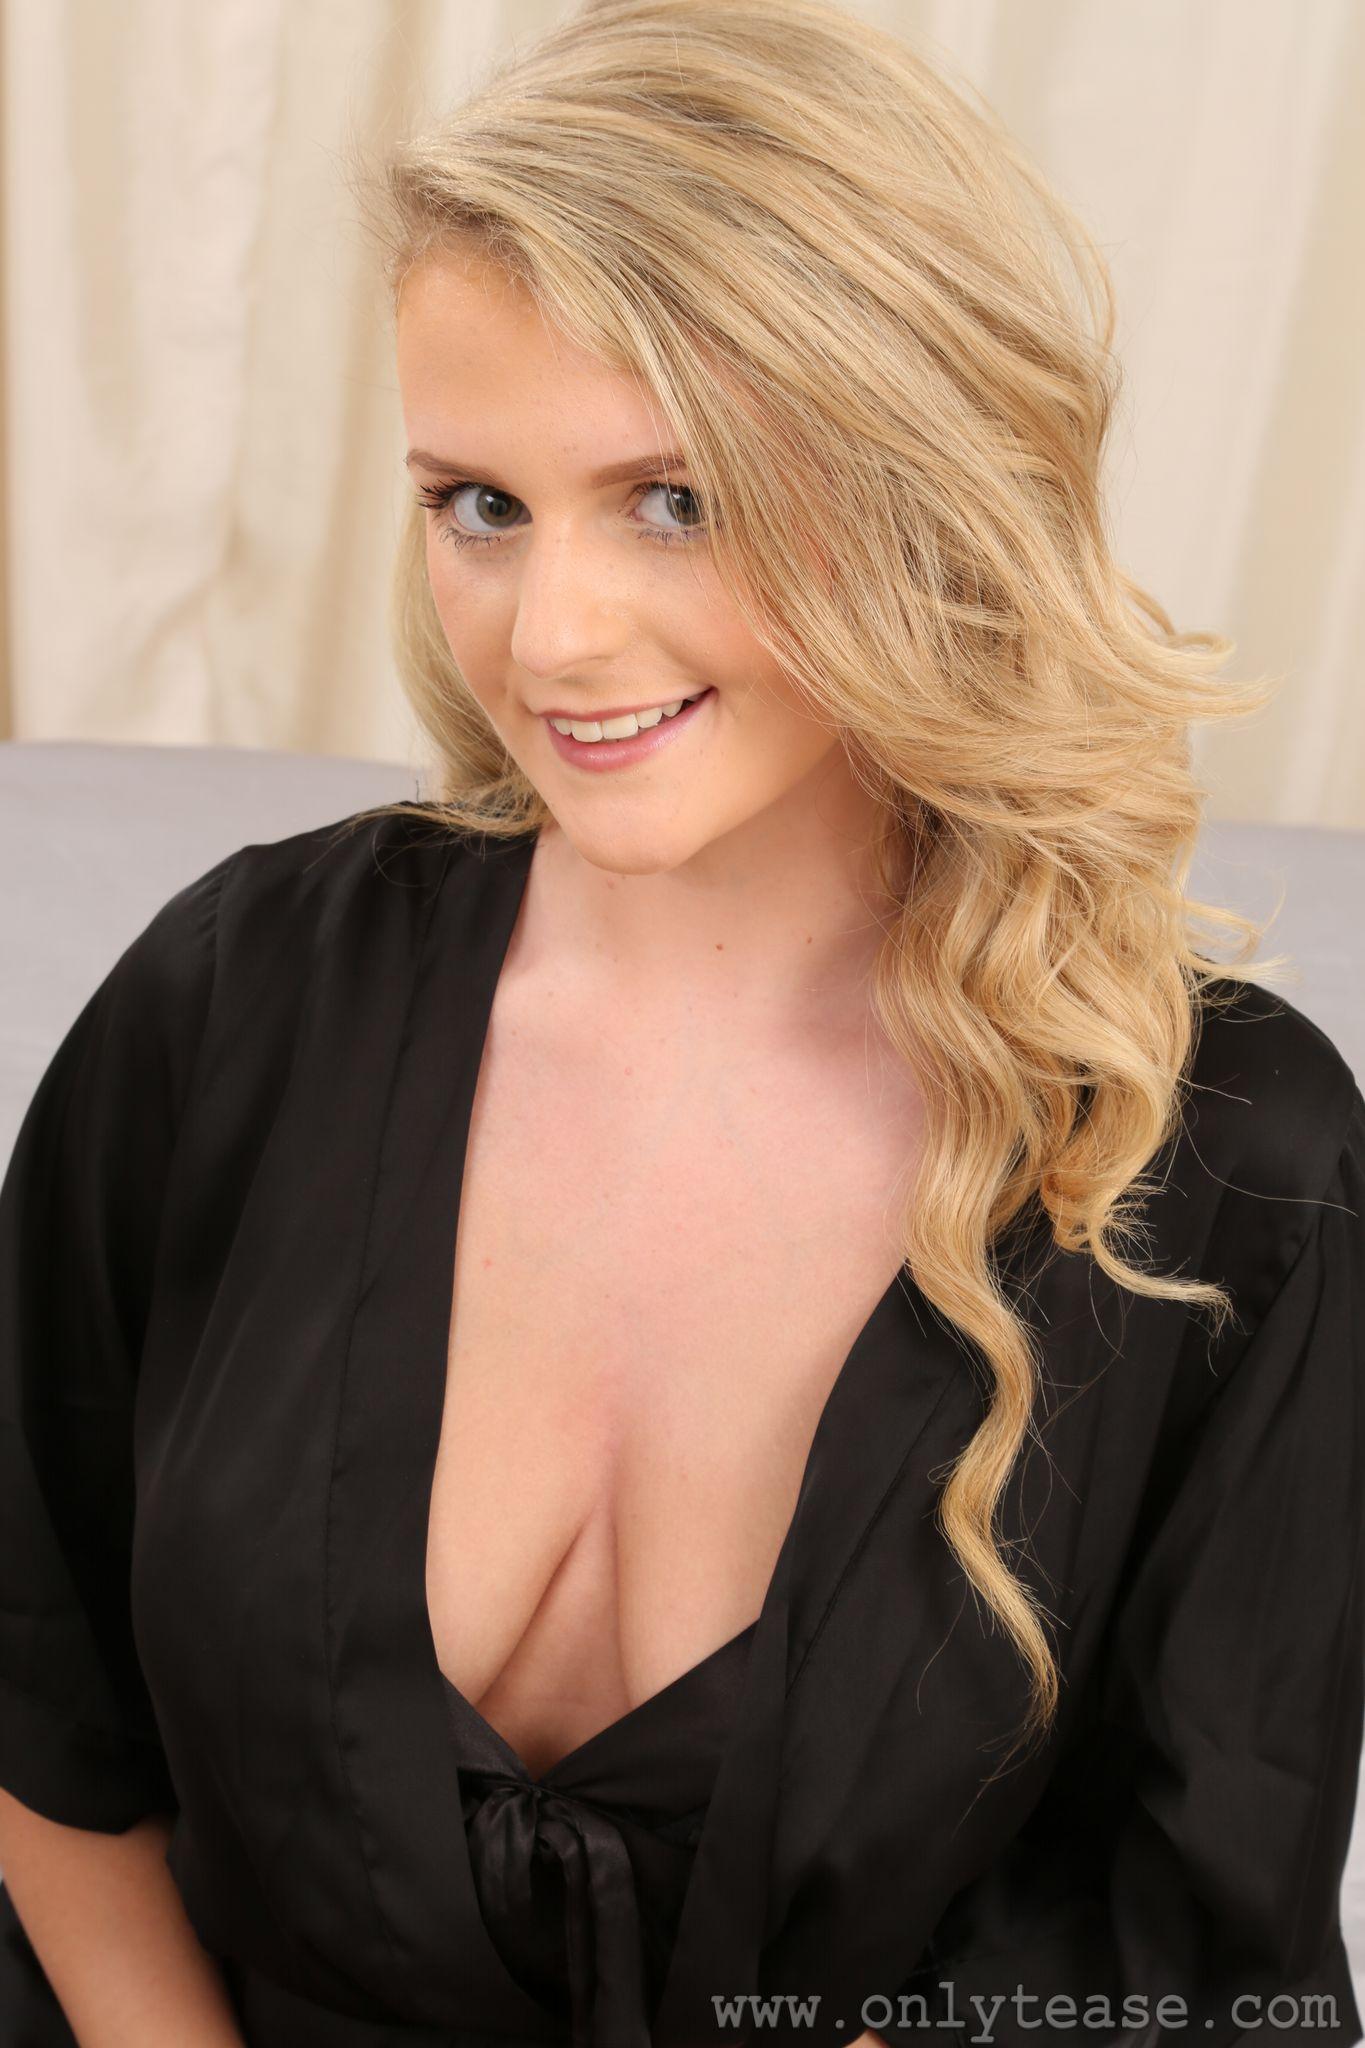 http://www.primecurves.com/lycia-black-silk-lingerie-stripping/2.jpg